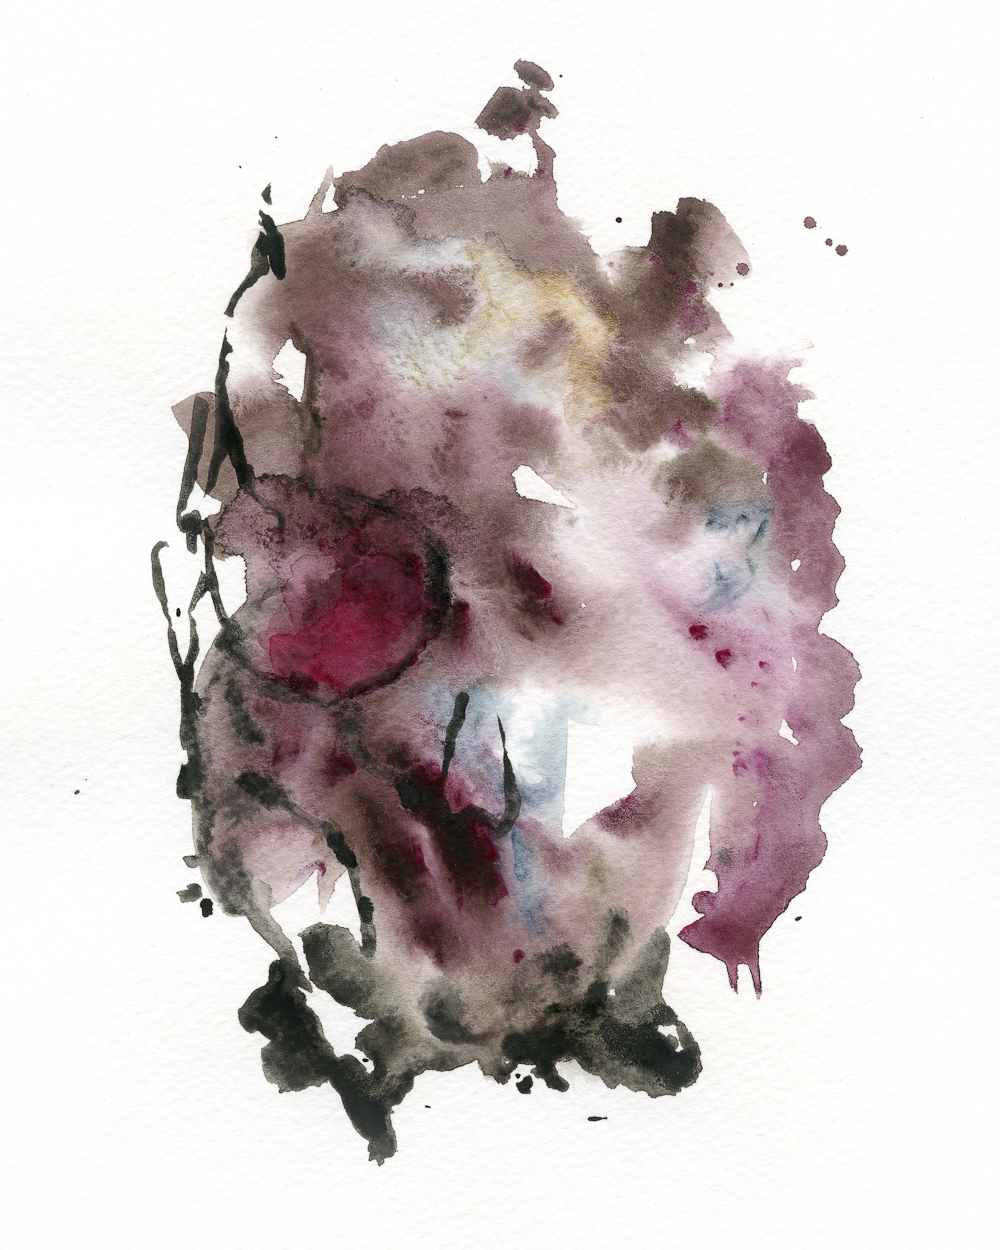 watercolor004.jpg